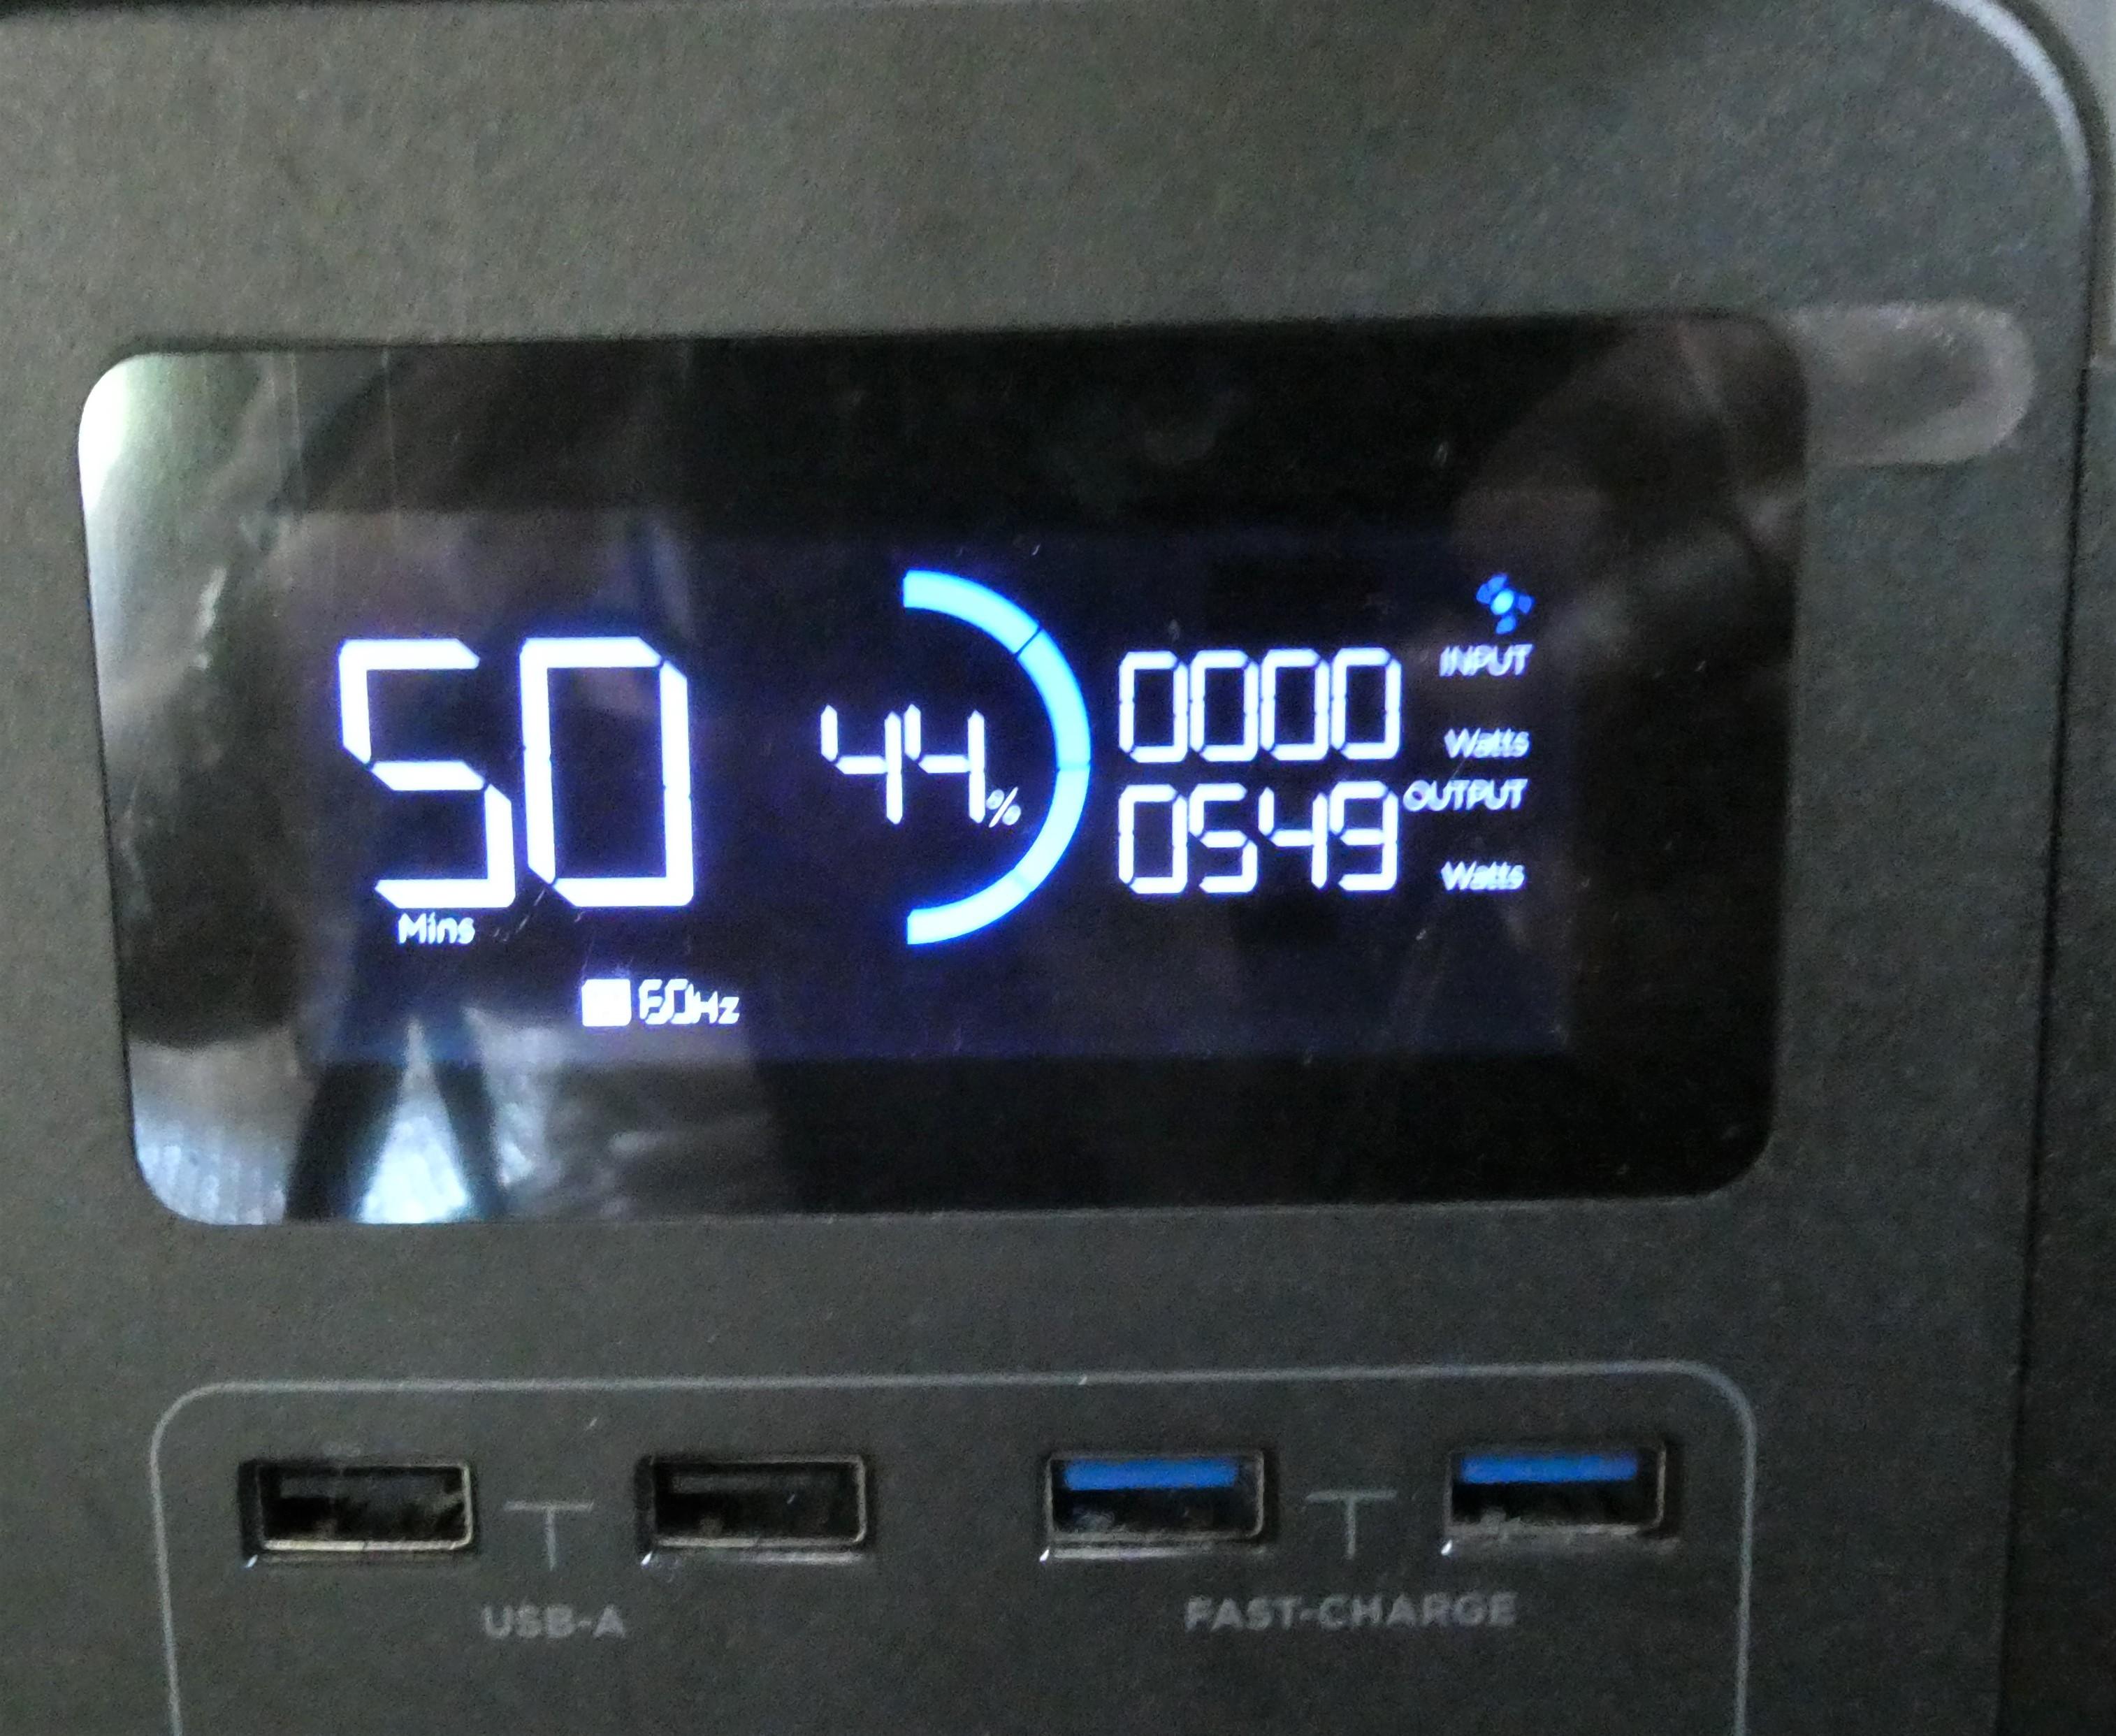 P1010062 (2)